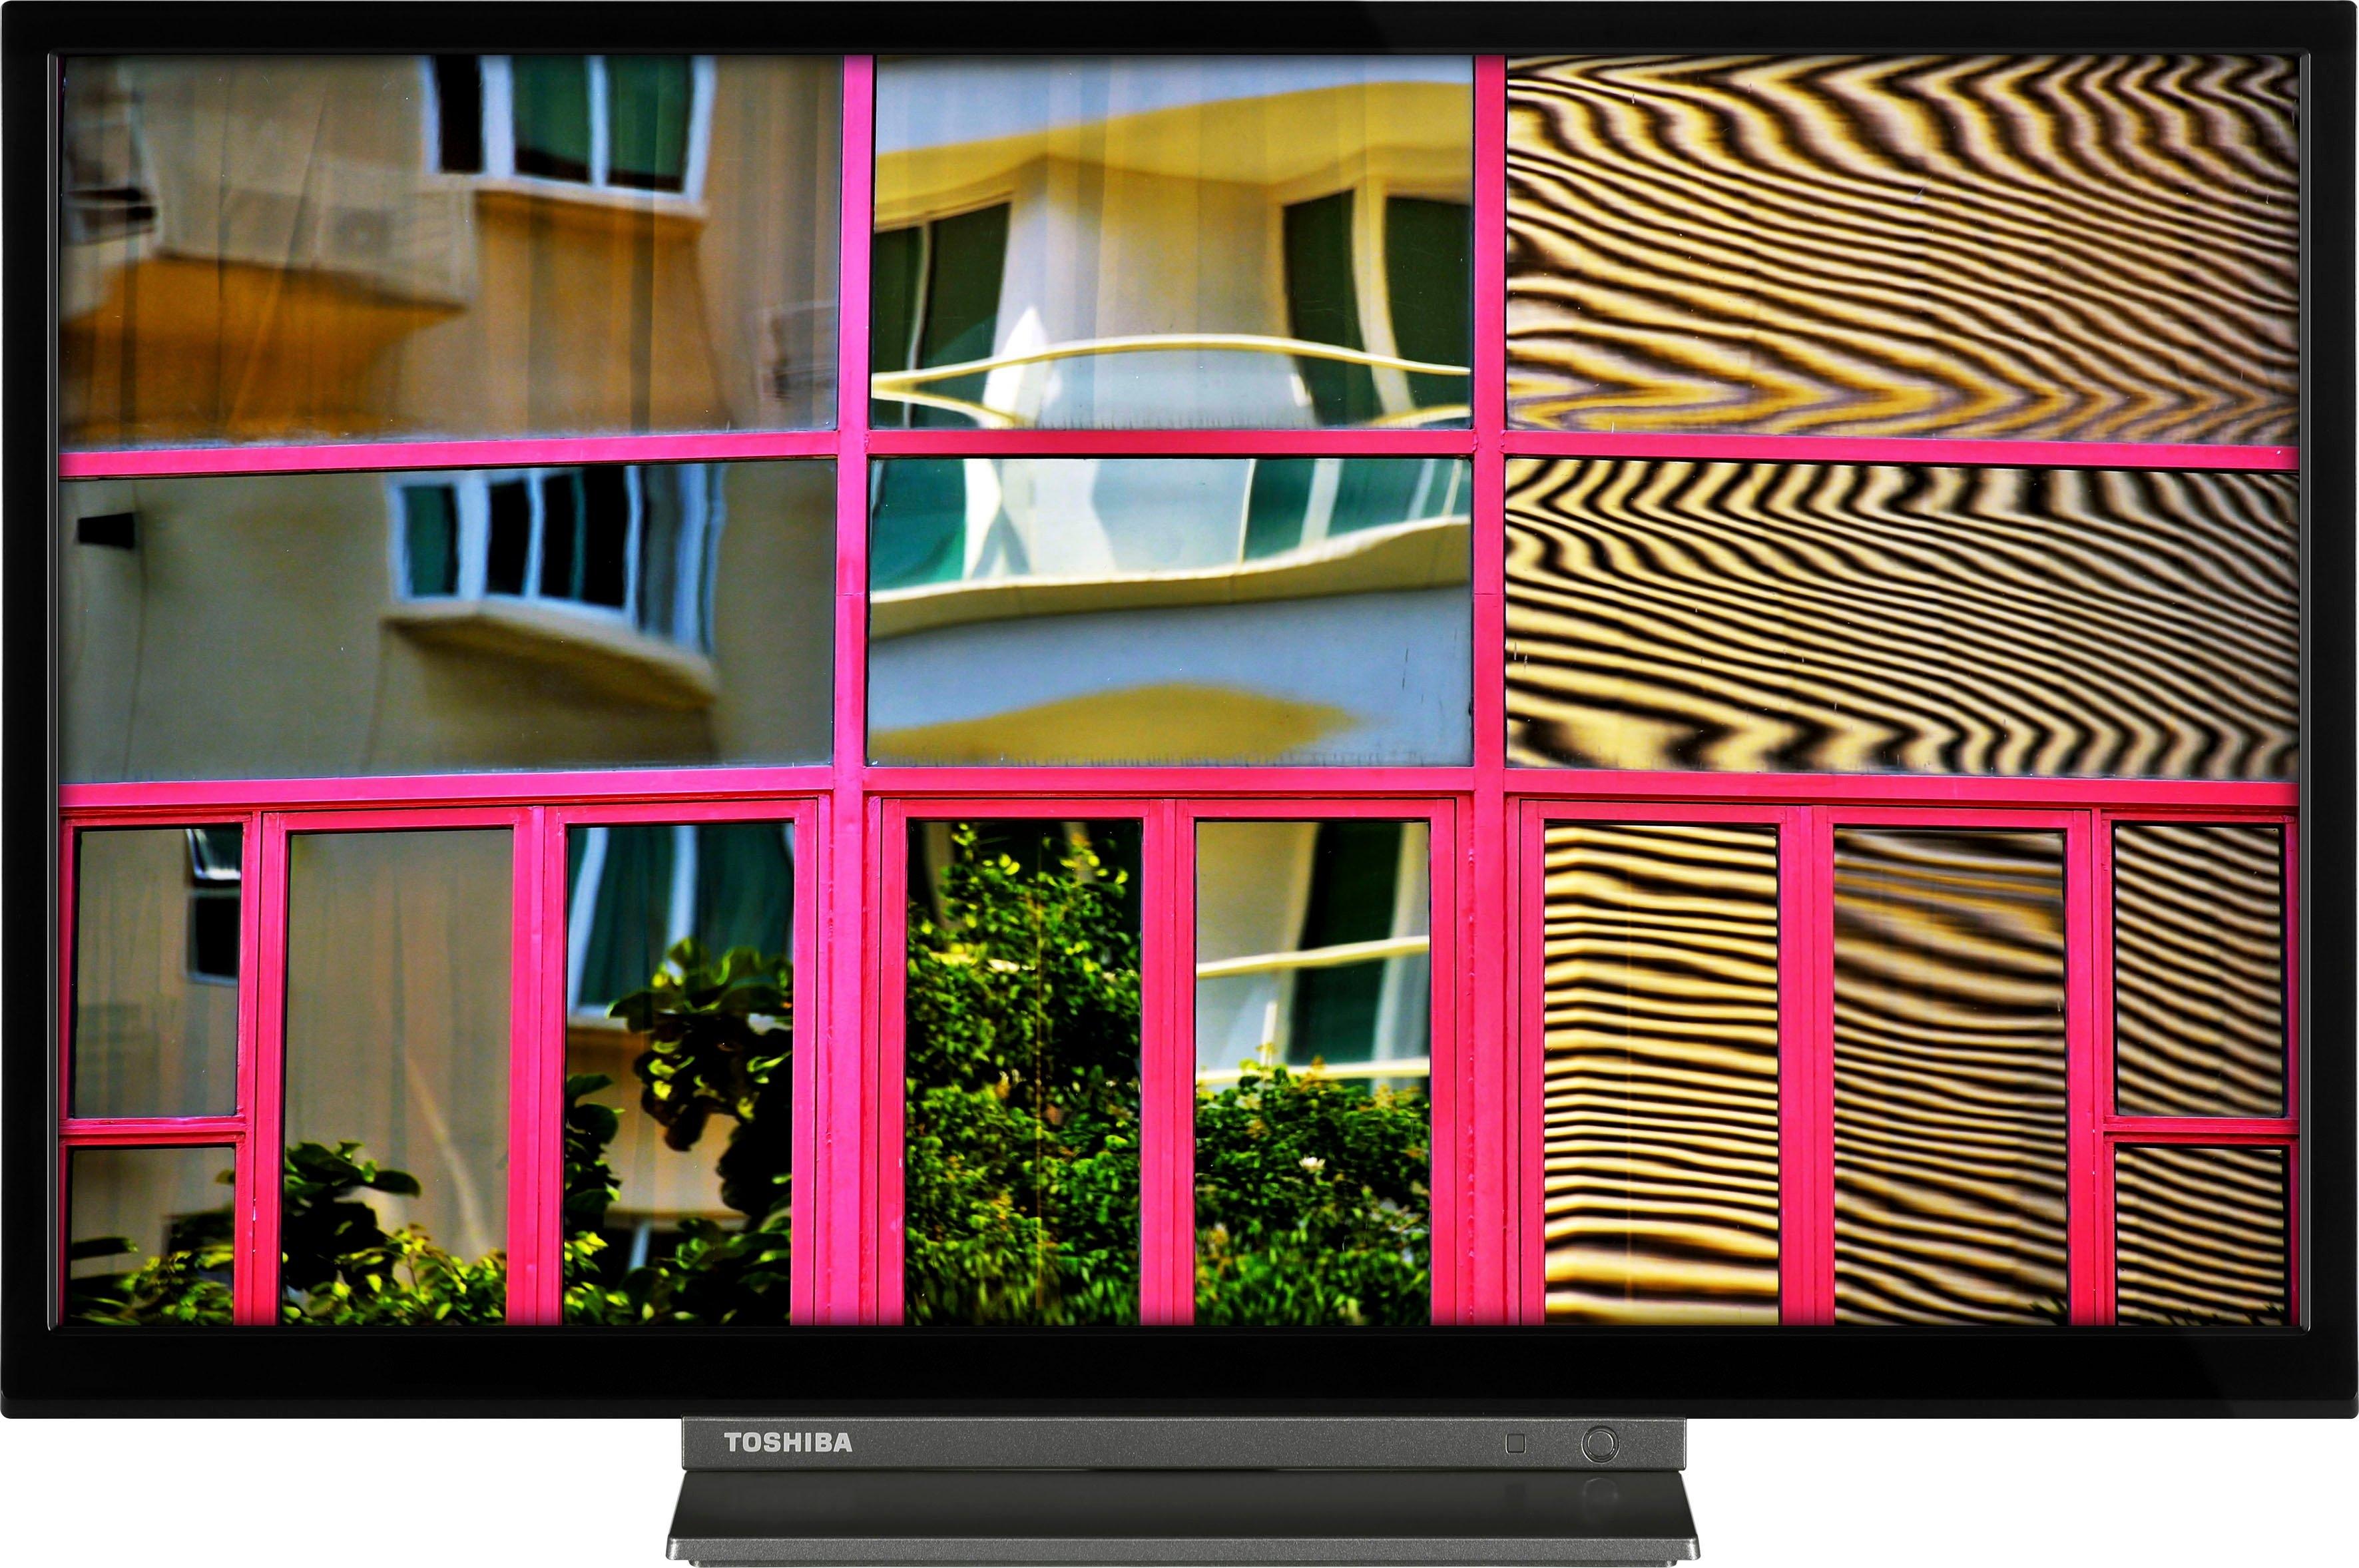 Toshiba LED-TV 24WL3C63DA, 60 cm / 24